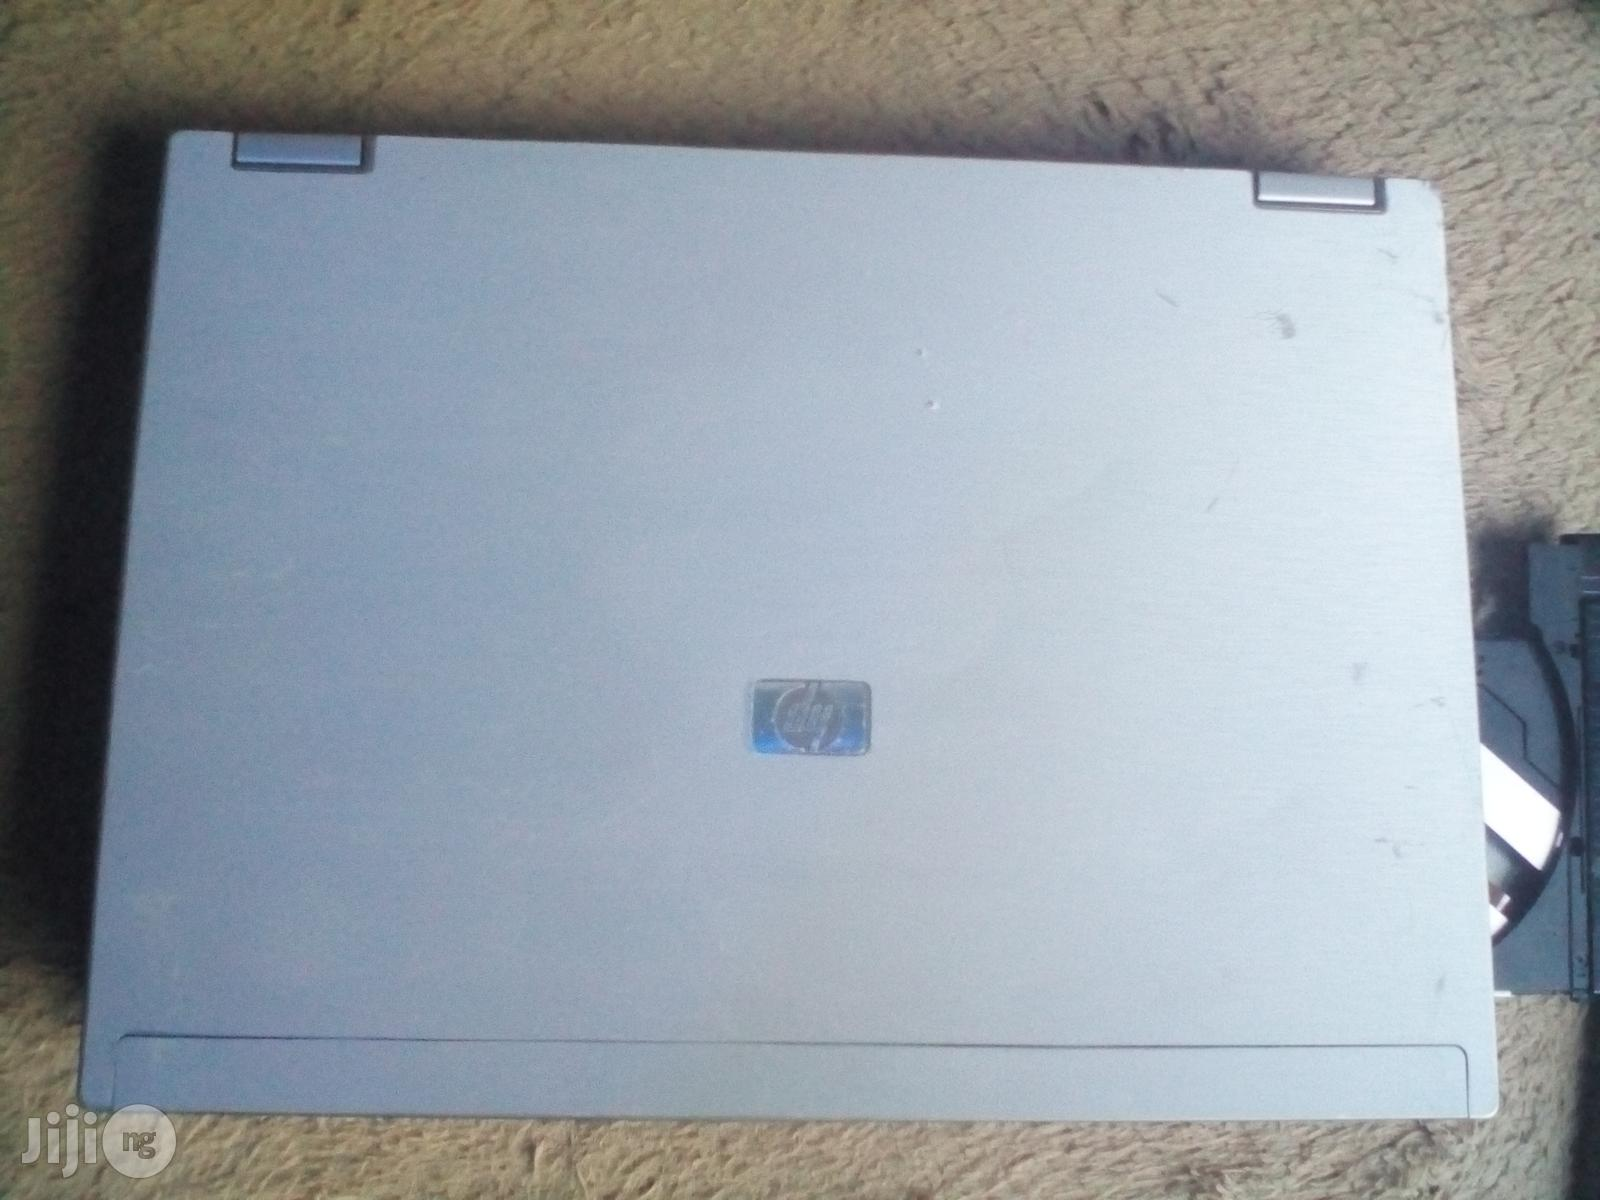 Laptop HP EliteBook 6930P 2GB Intel Core 2 Duo HDD 160GB | Laptops & Computers for sale in Benin City, Edo State, Nigeria